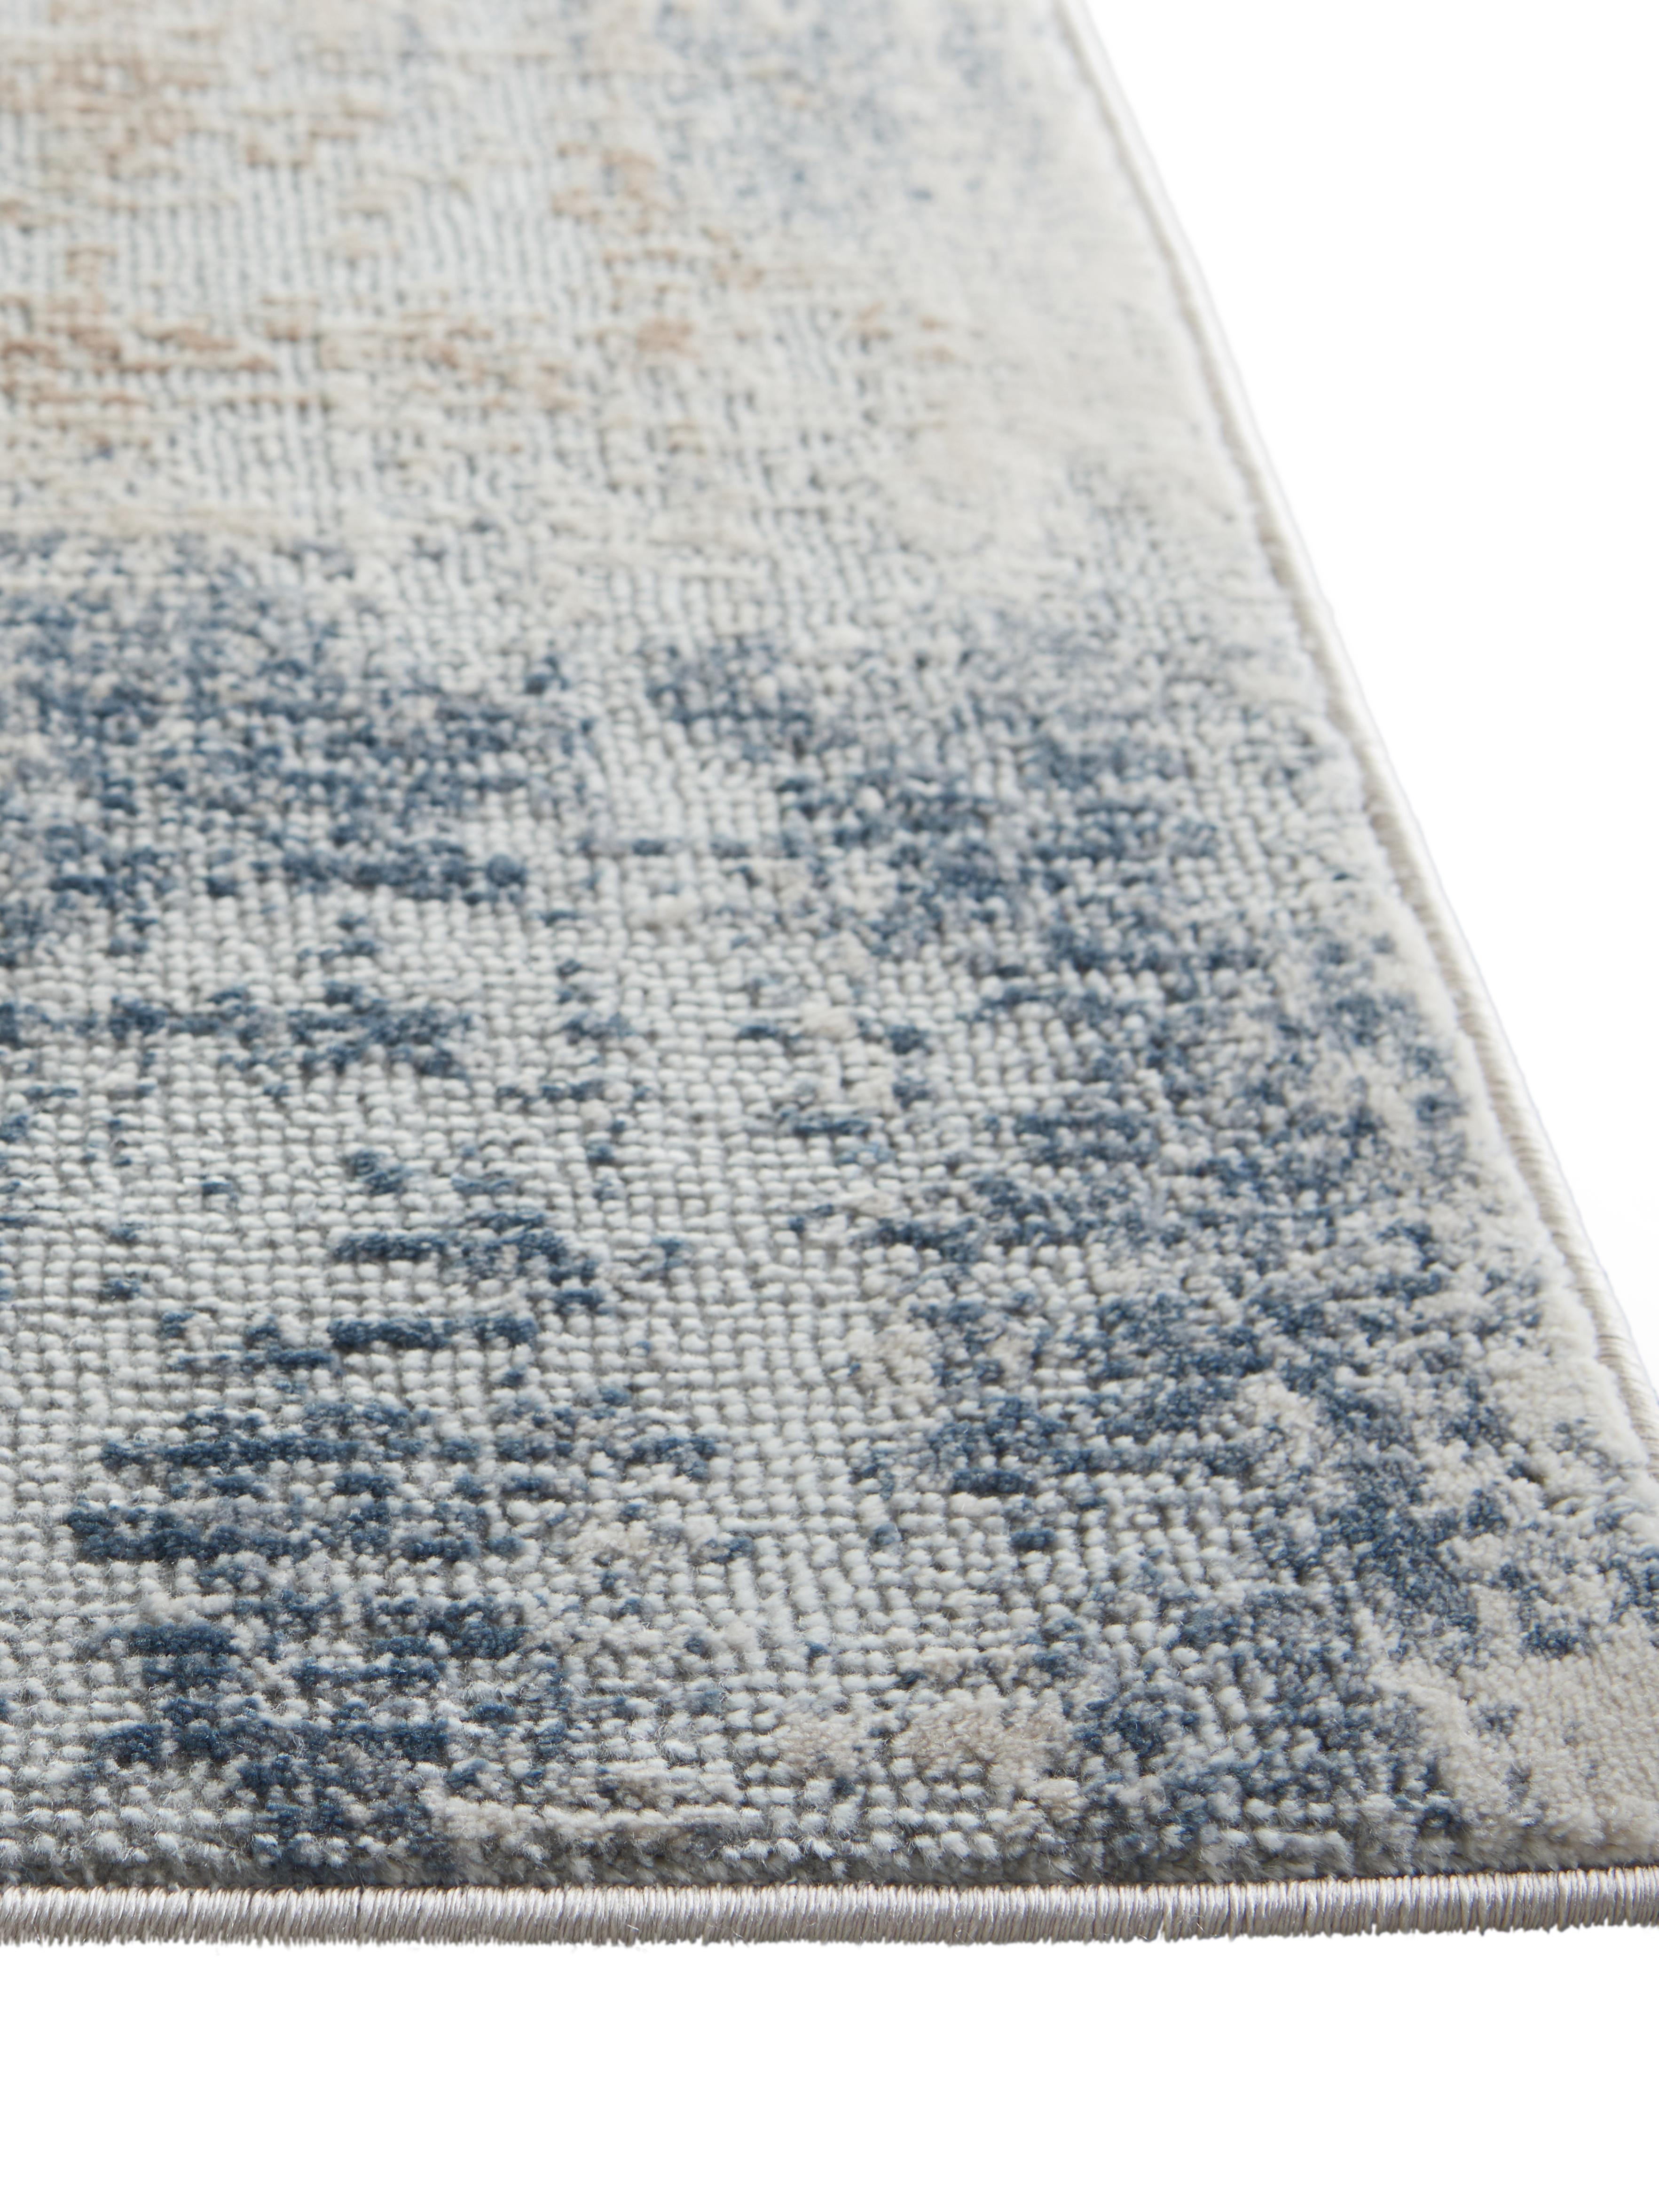 Design Läufer Rustic Textures II, Flor: 51%Polypropylen, 49%Pol, Beigetöne, Grau, 65 x 230 cm